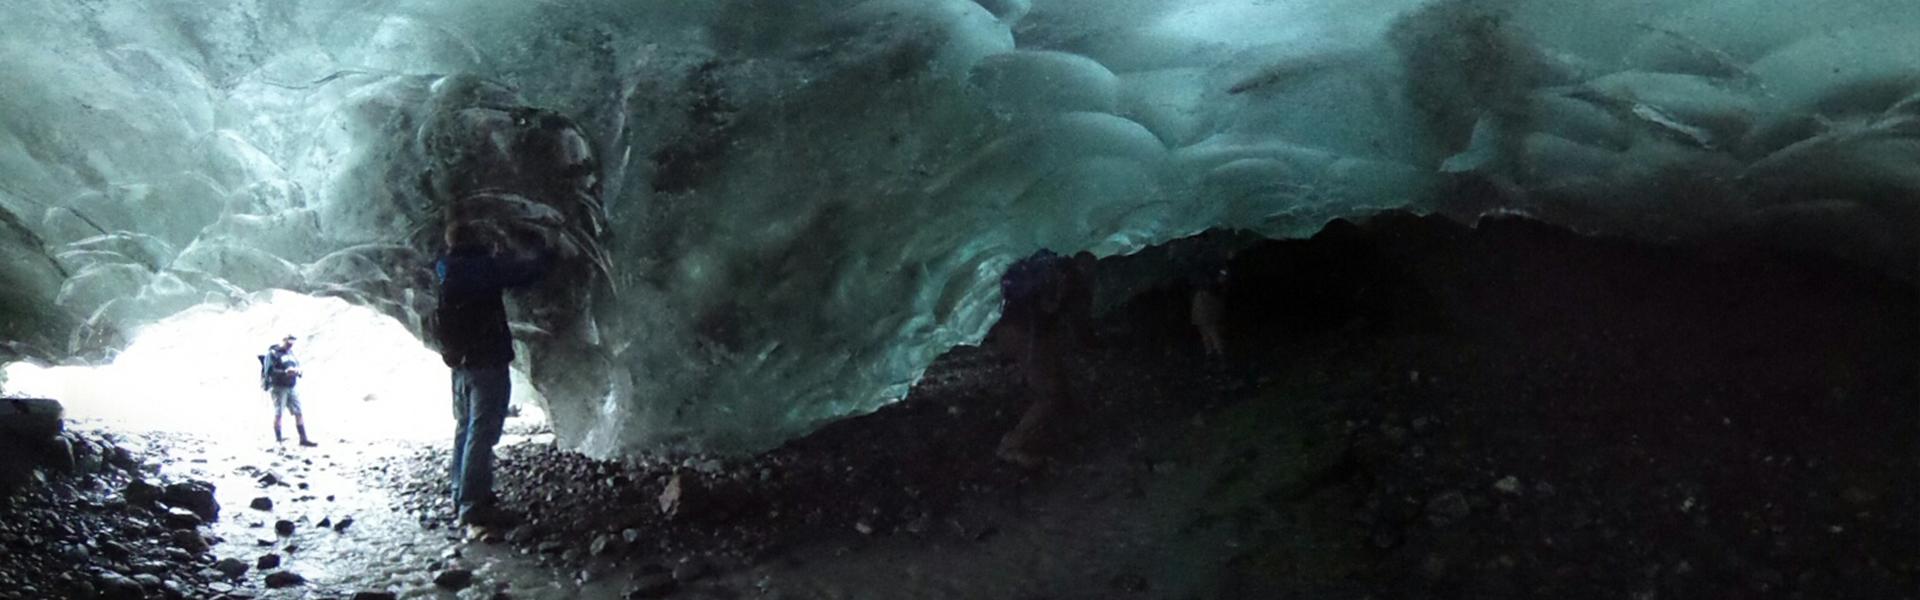 CAUSE ice